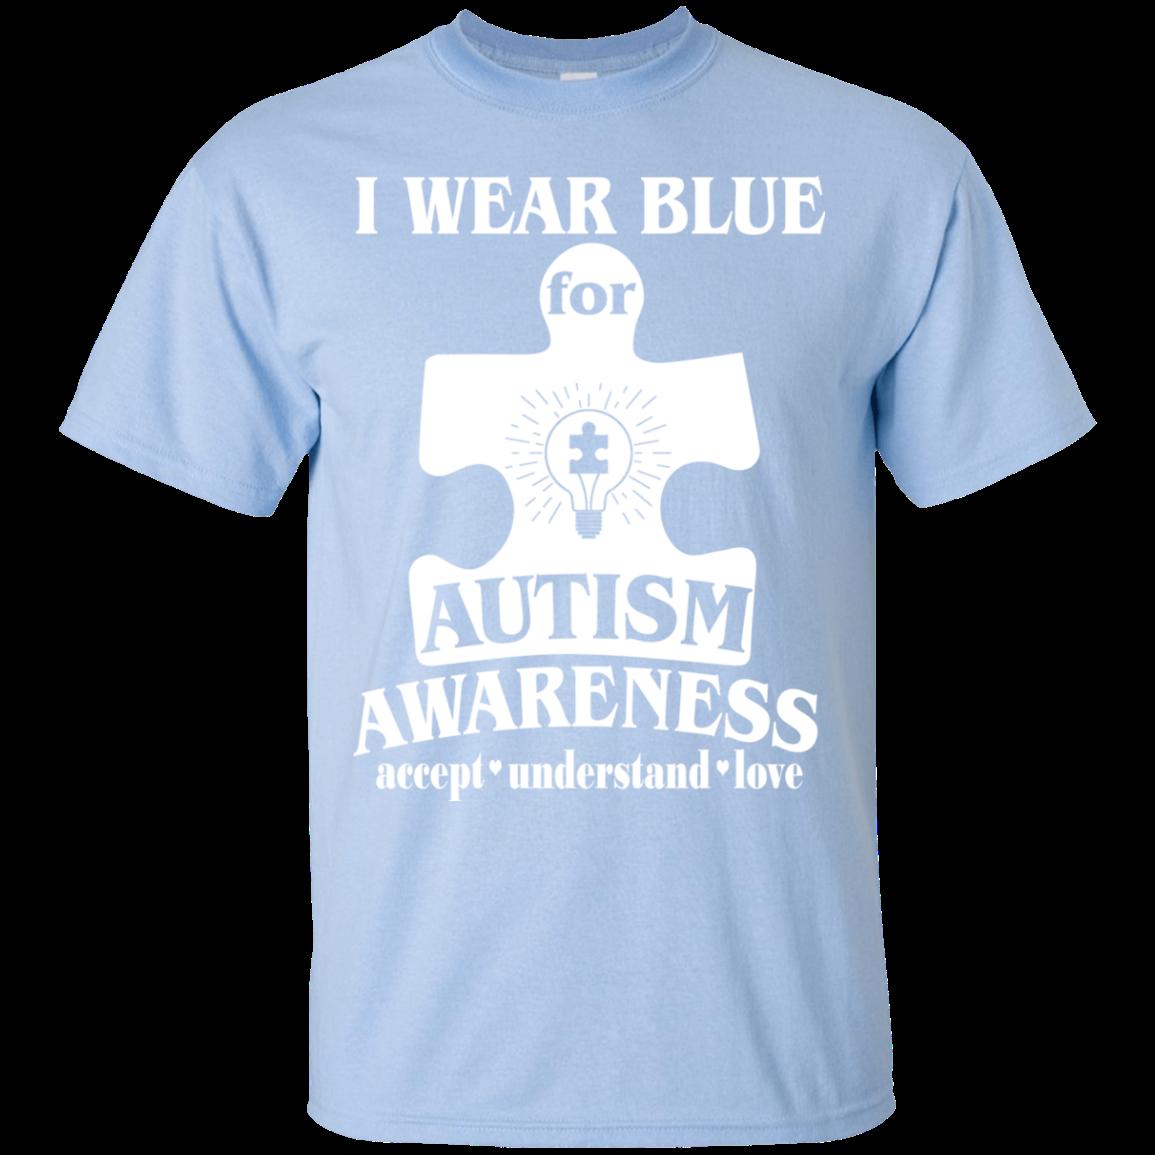 how to wear a blue shirt